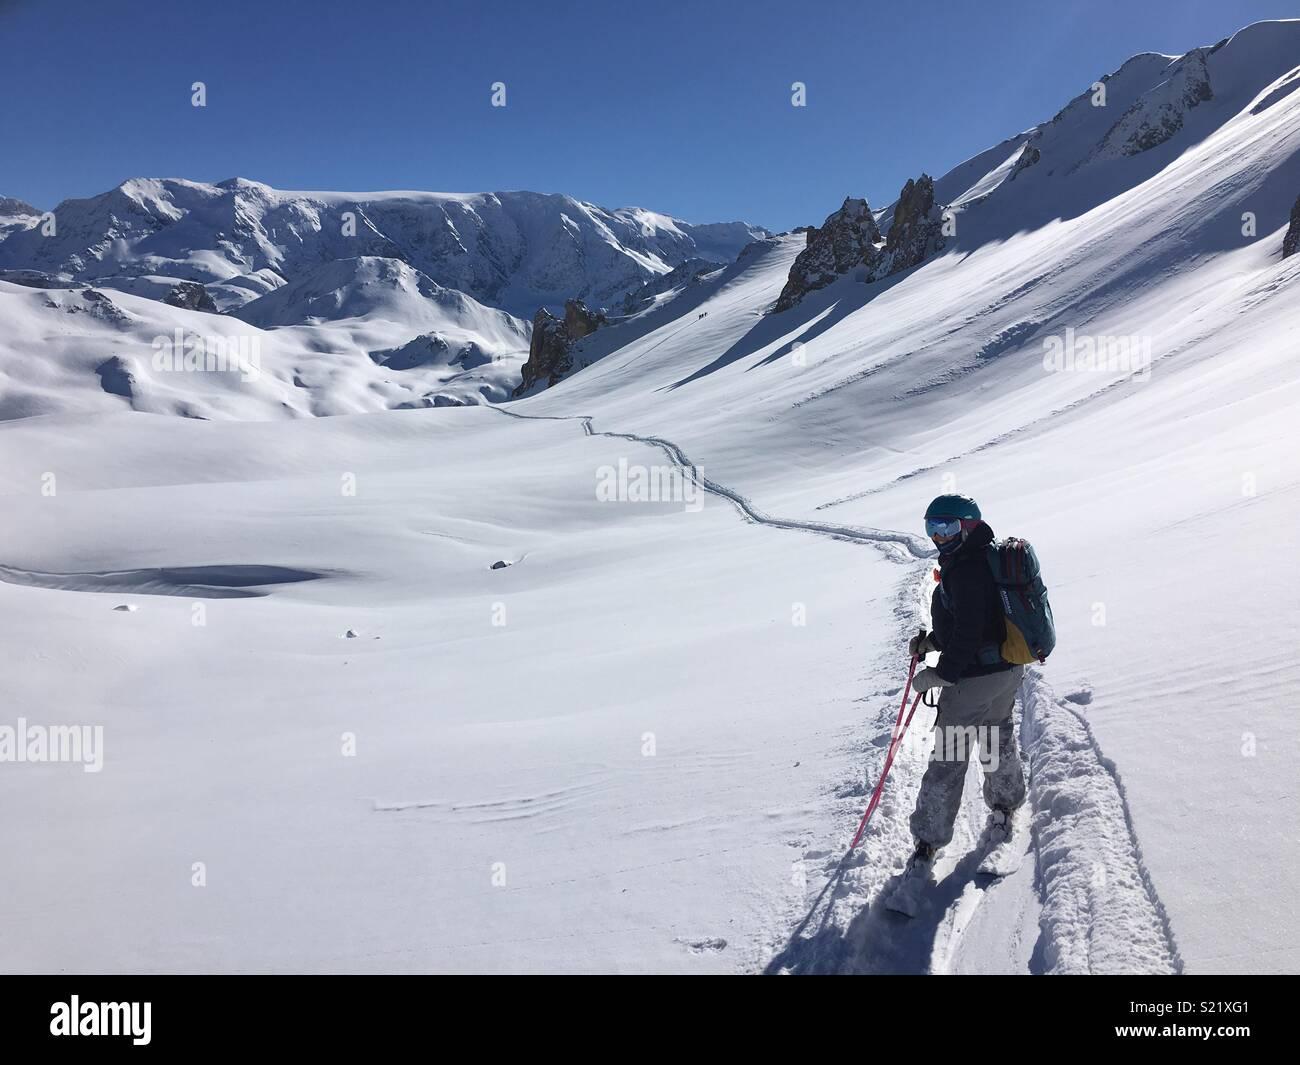 Snowy adventure - Stock Image